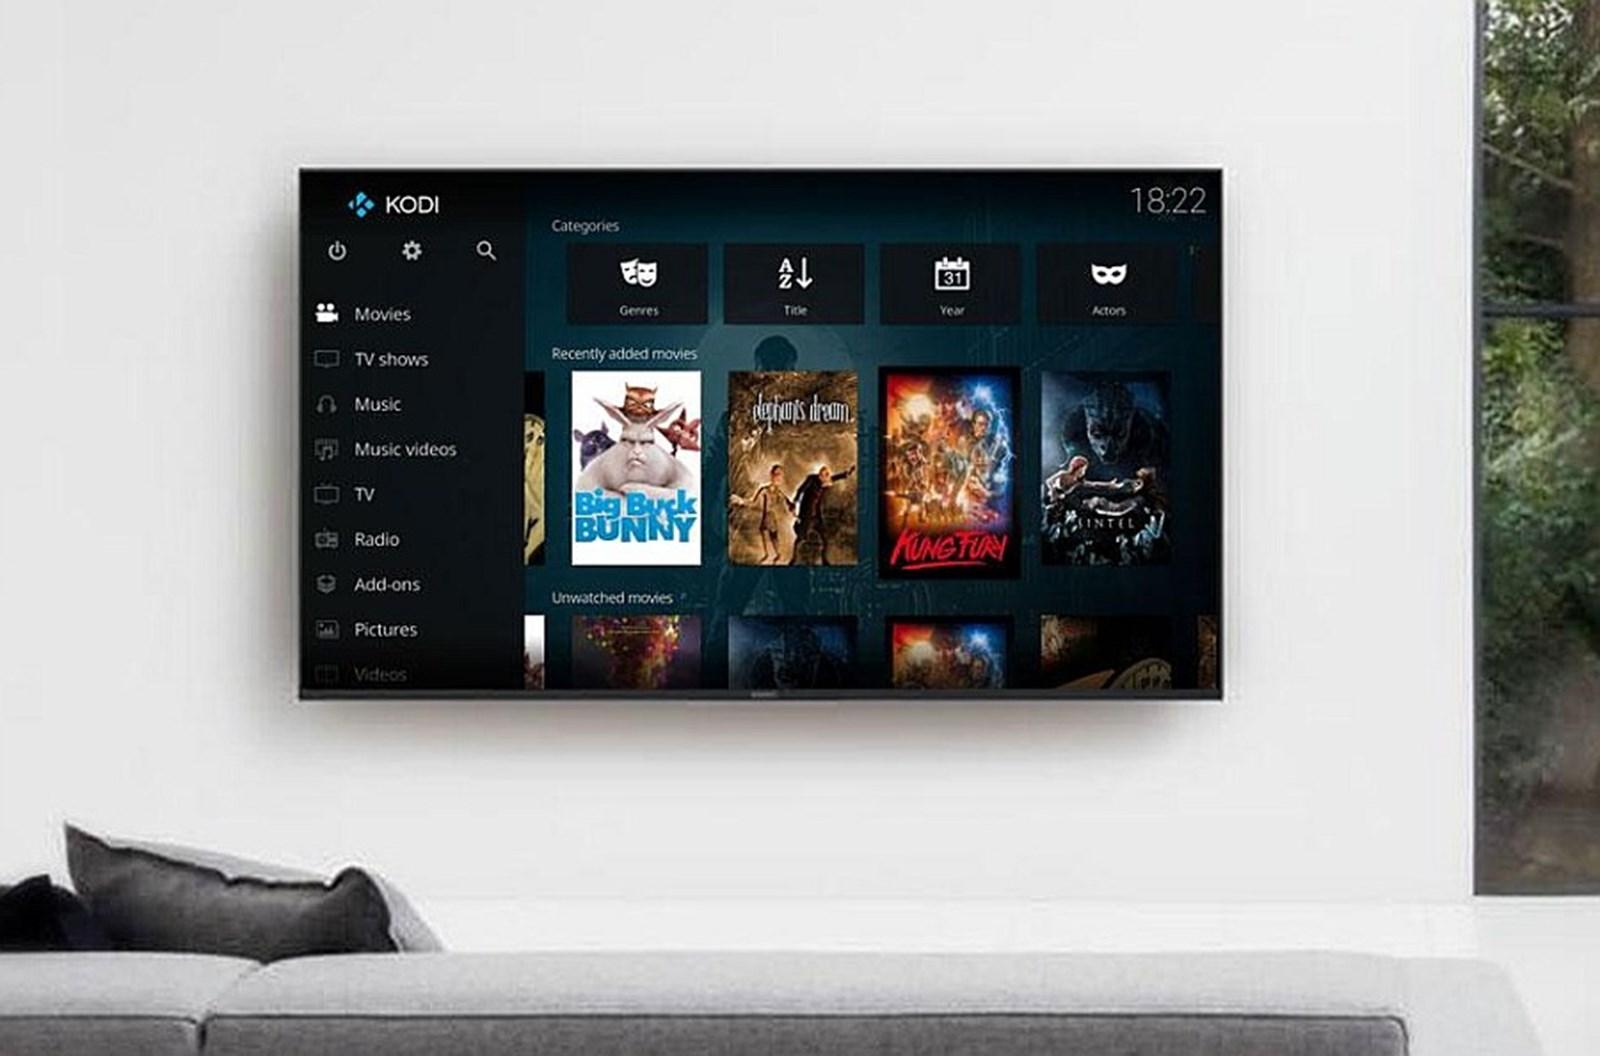 Sony-Fernseher blockieren offenbar Mediacenter Kodi